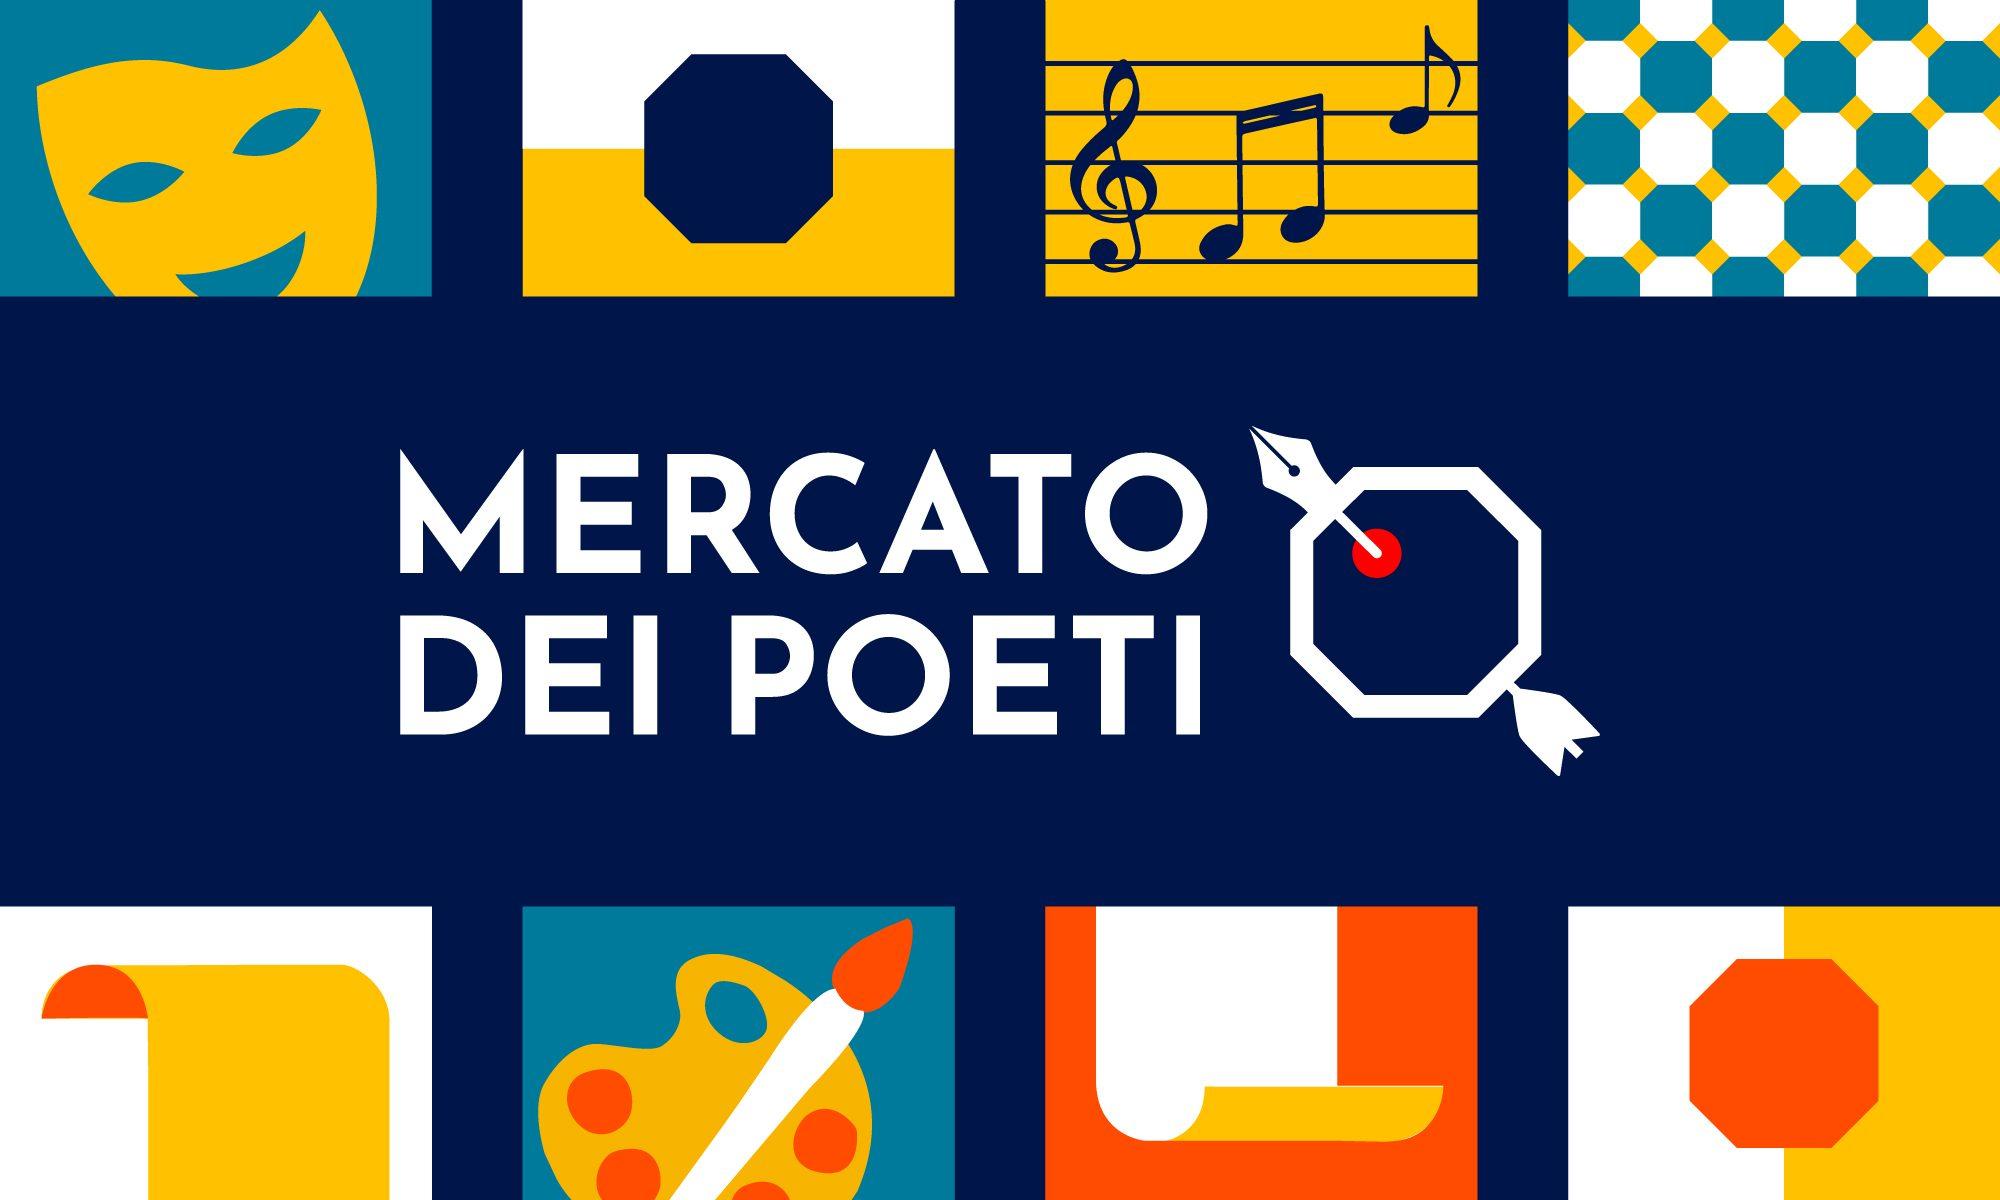 Mercato dei Poeti